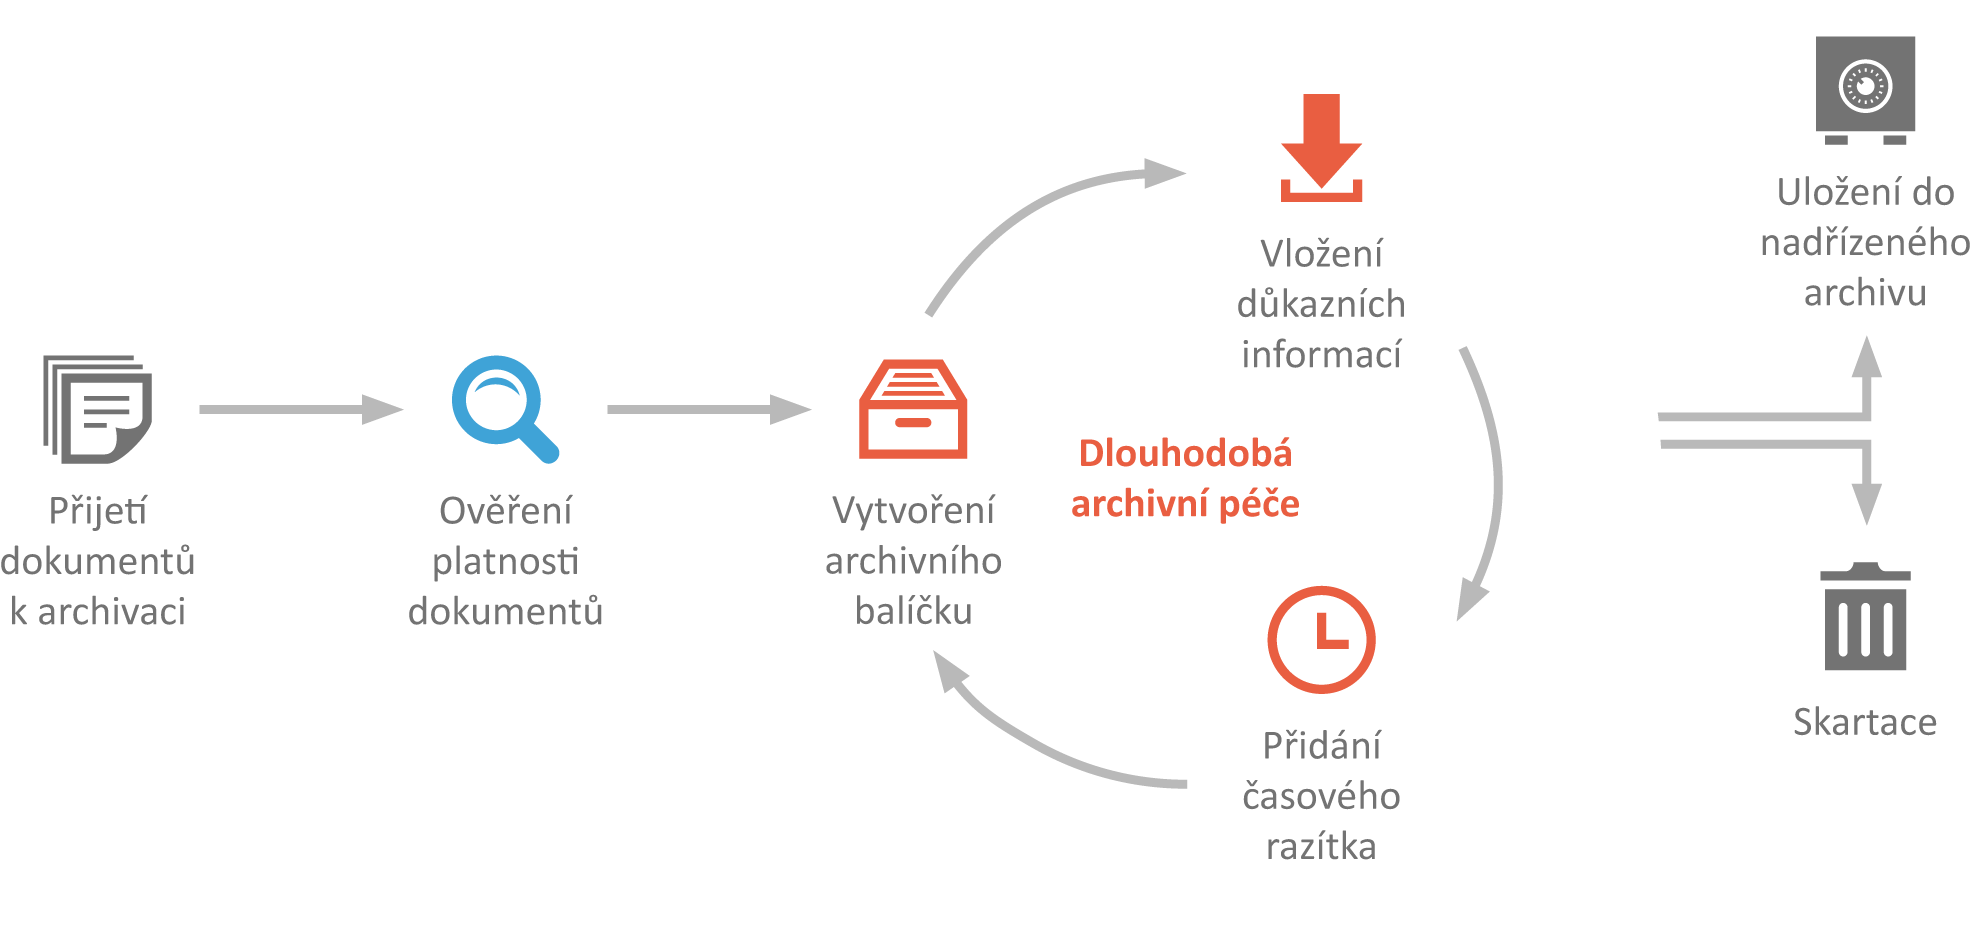 sefira-obelisk-trusted-archive-schema